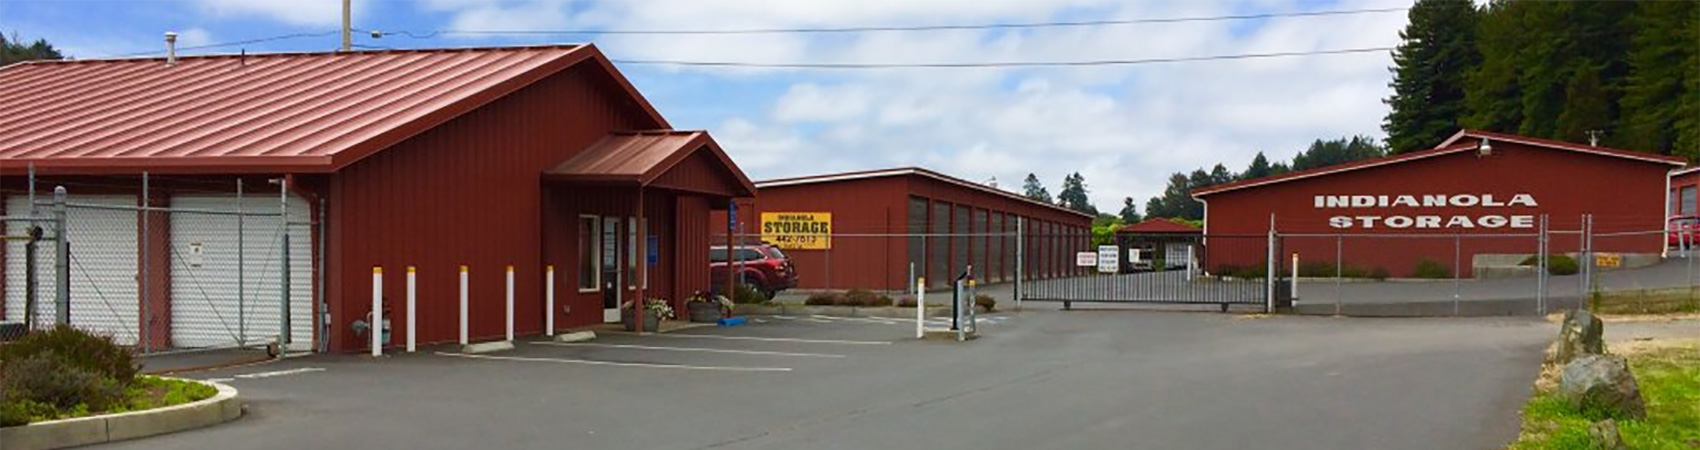 Storage Facility in Eureka, CA | Secure Self Storage Facility